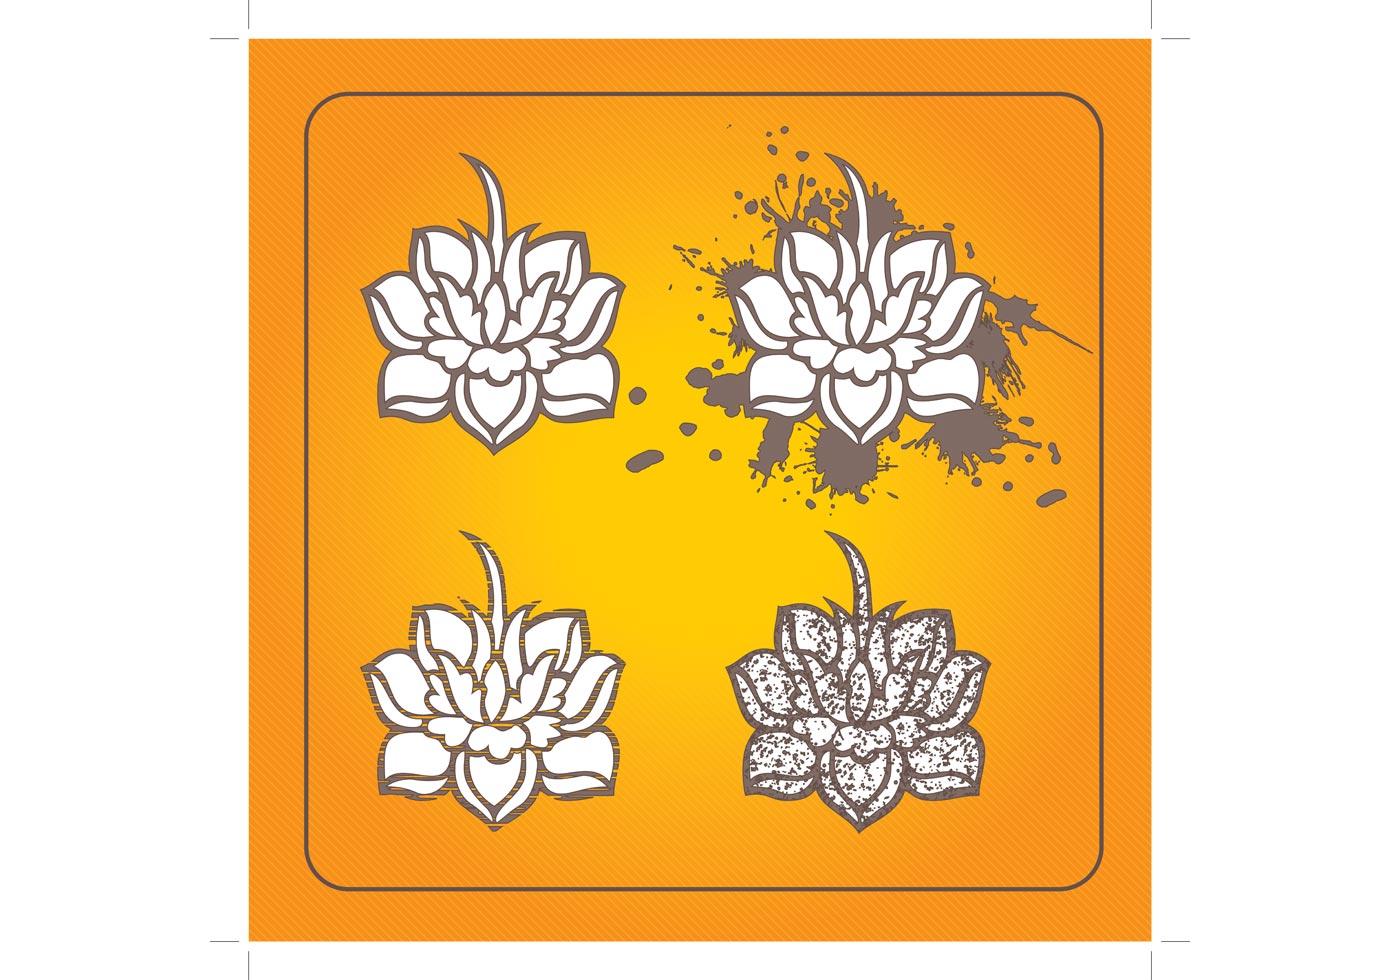 Lotus Flower Free Vector Art 9171 Free Downloads